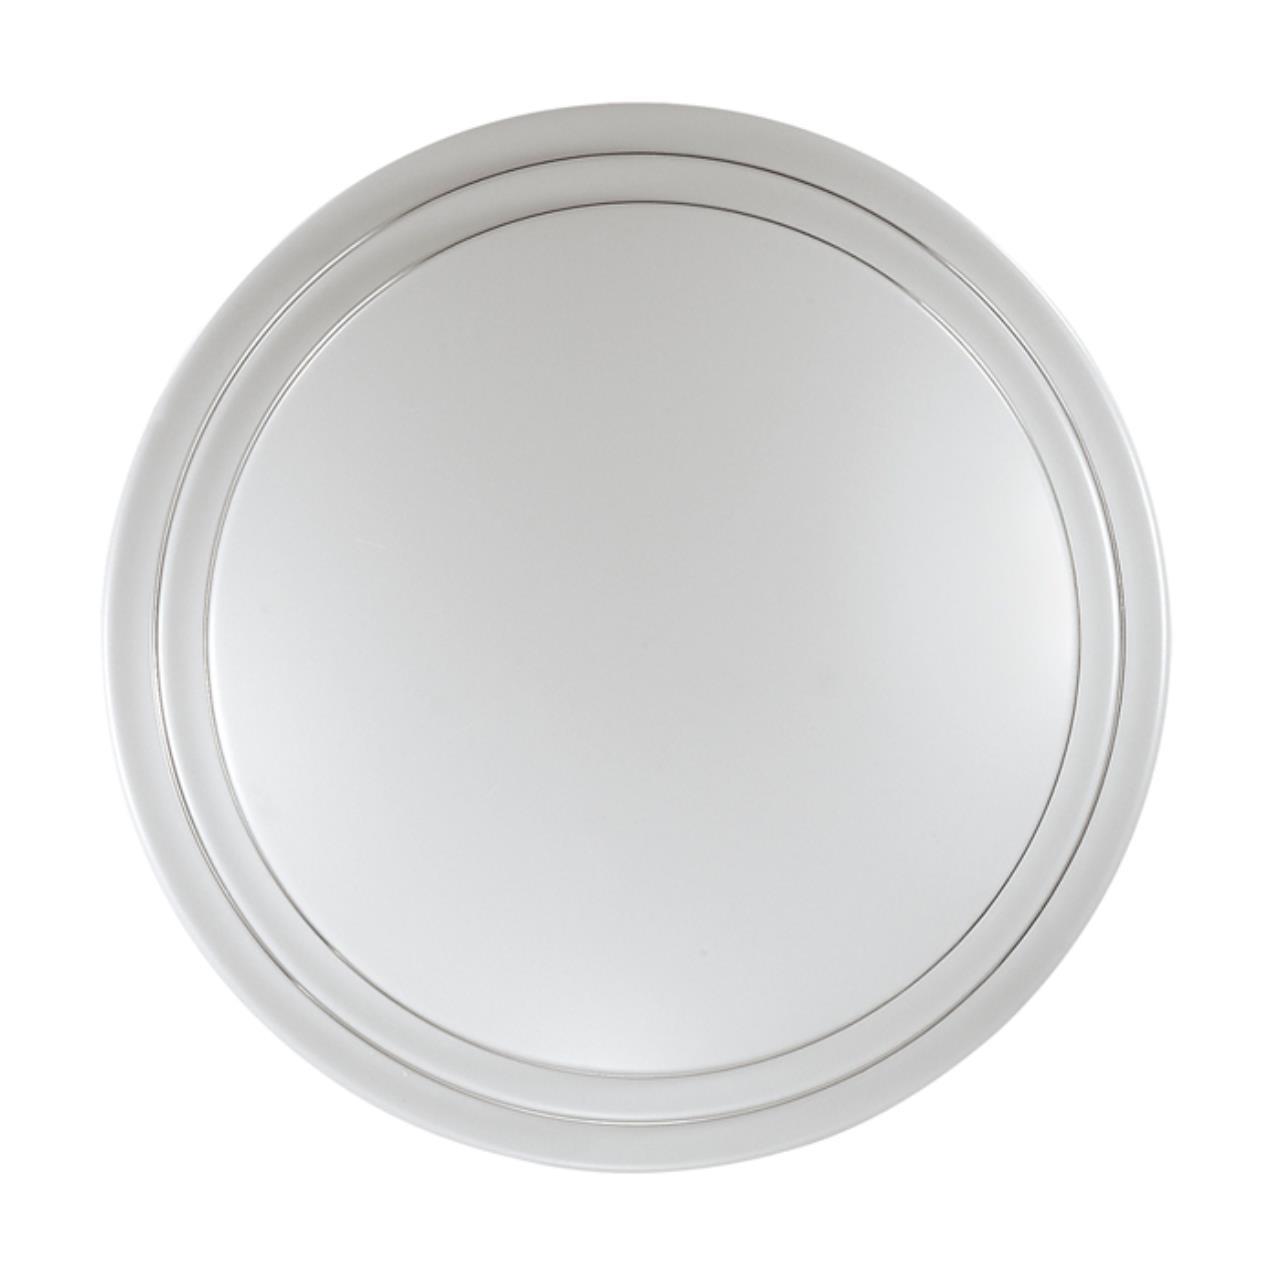 2046/DL SN 094 св-к FLIM пластик LED 48Вт 4000K D400 IP43